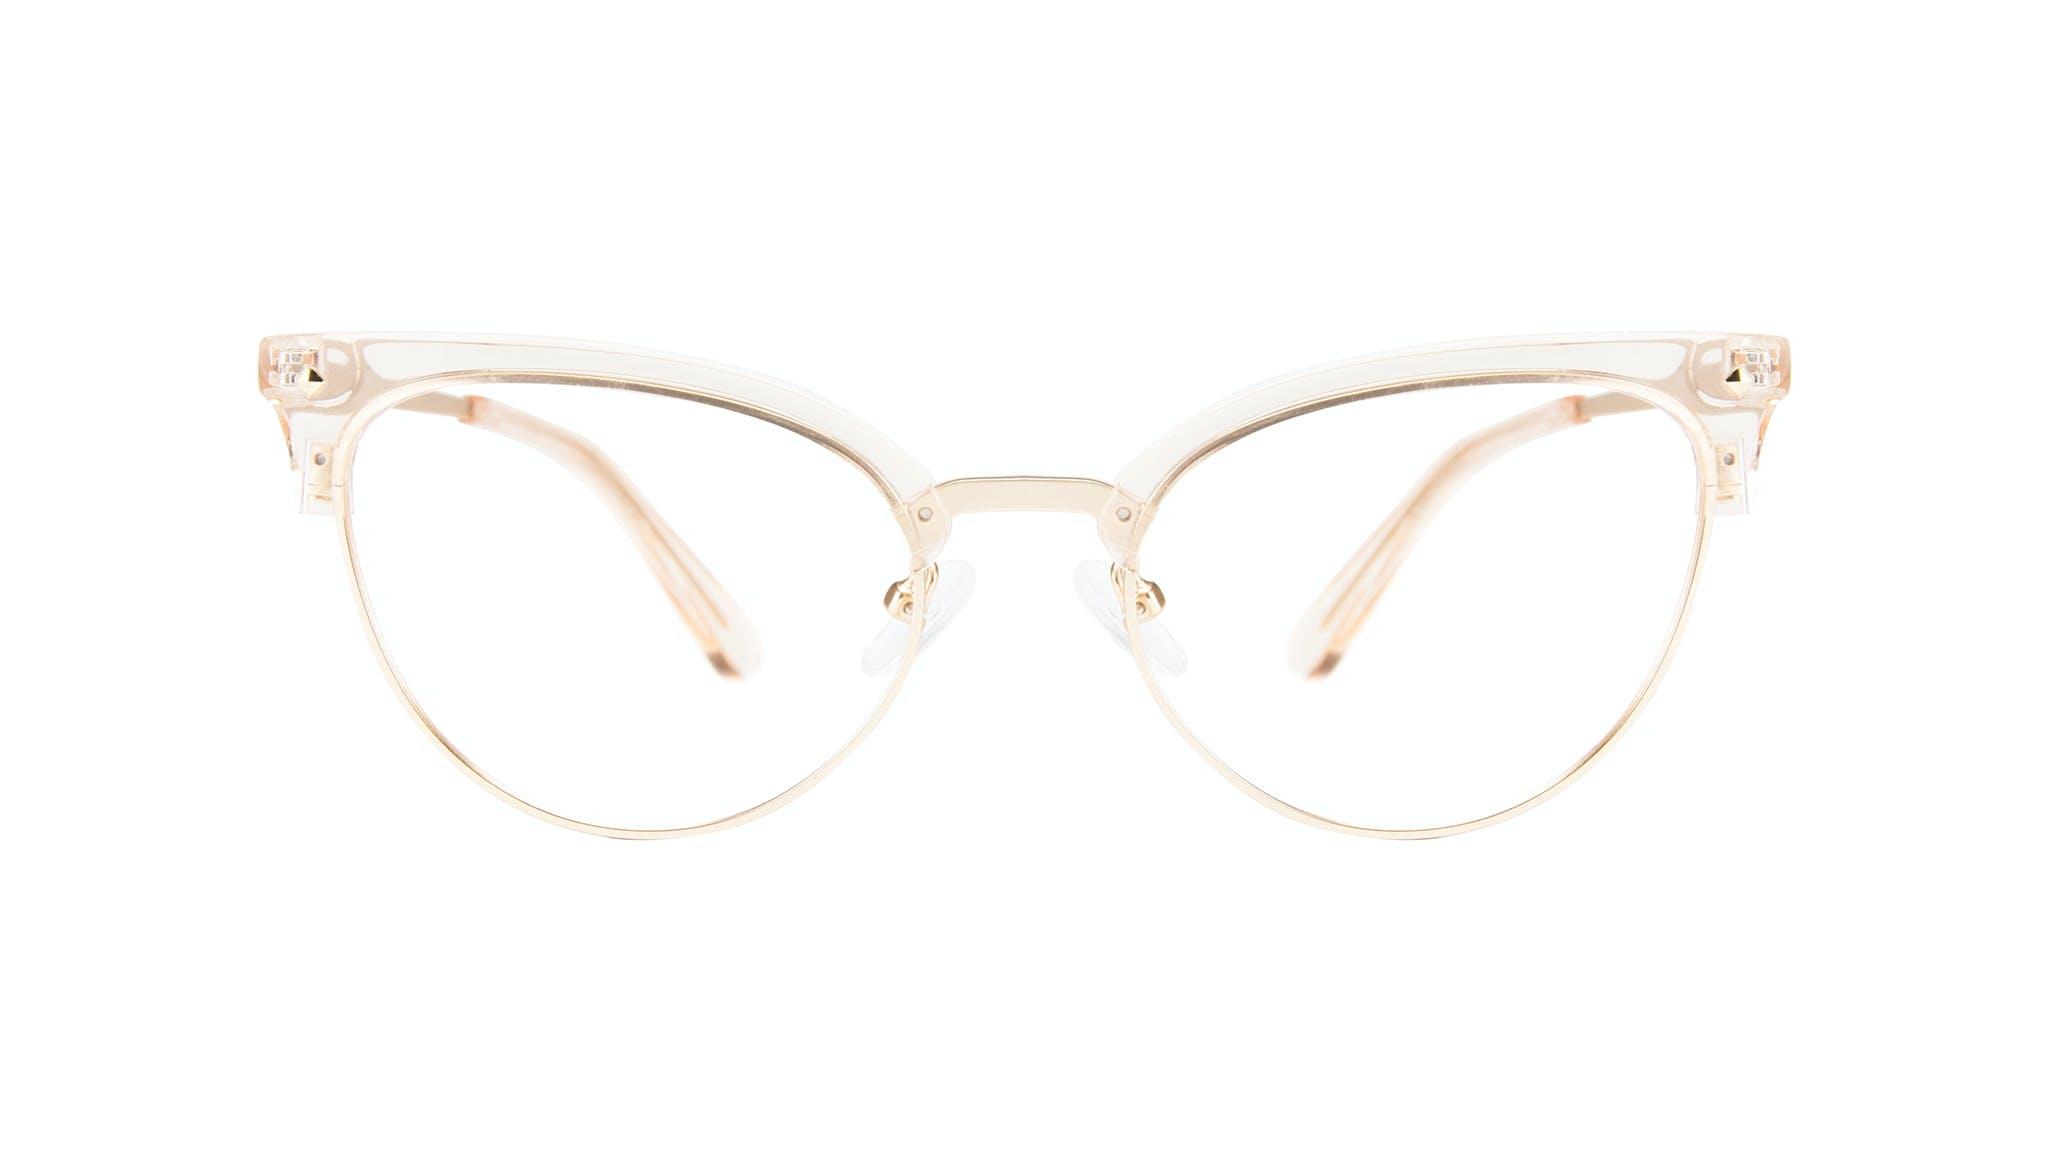 Affordable Fashion Glasses Cat Eye Daring Cateye Eyeglasses Women Moon Blond